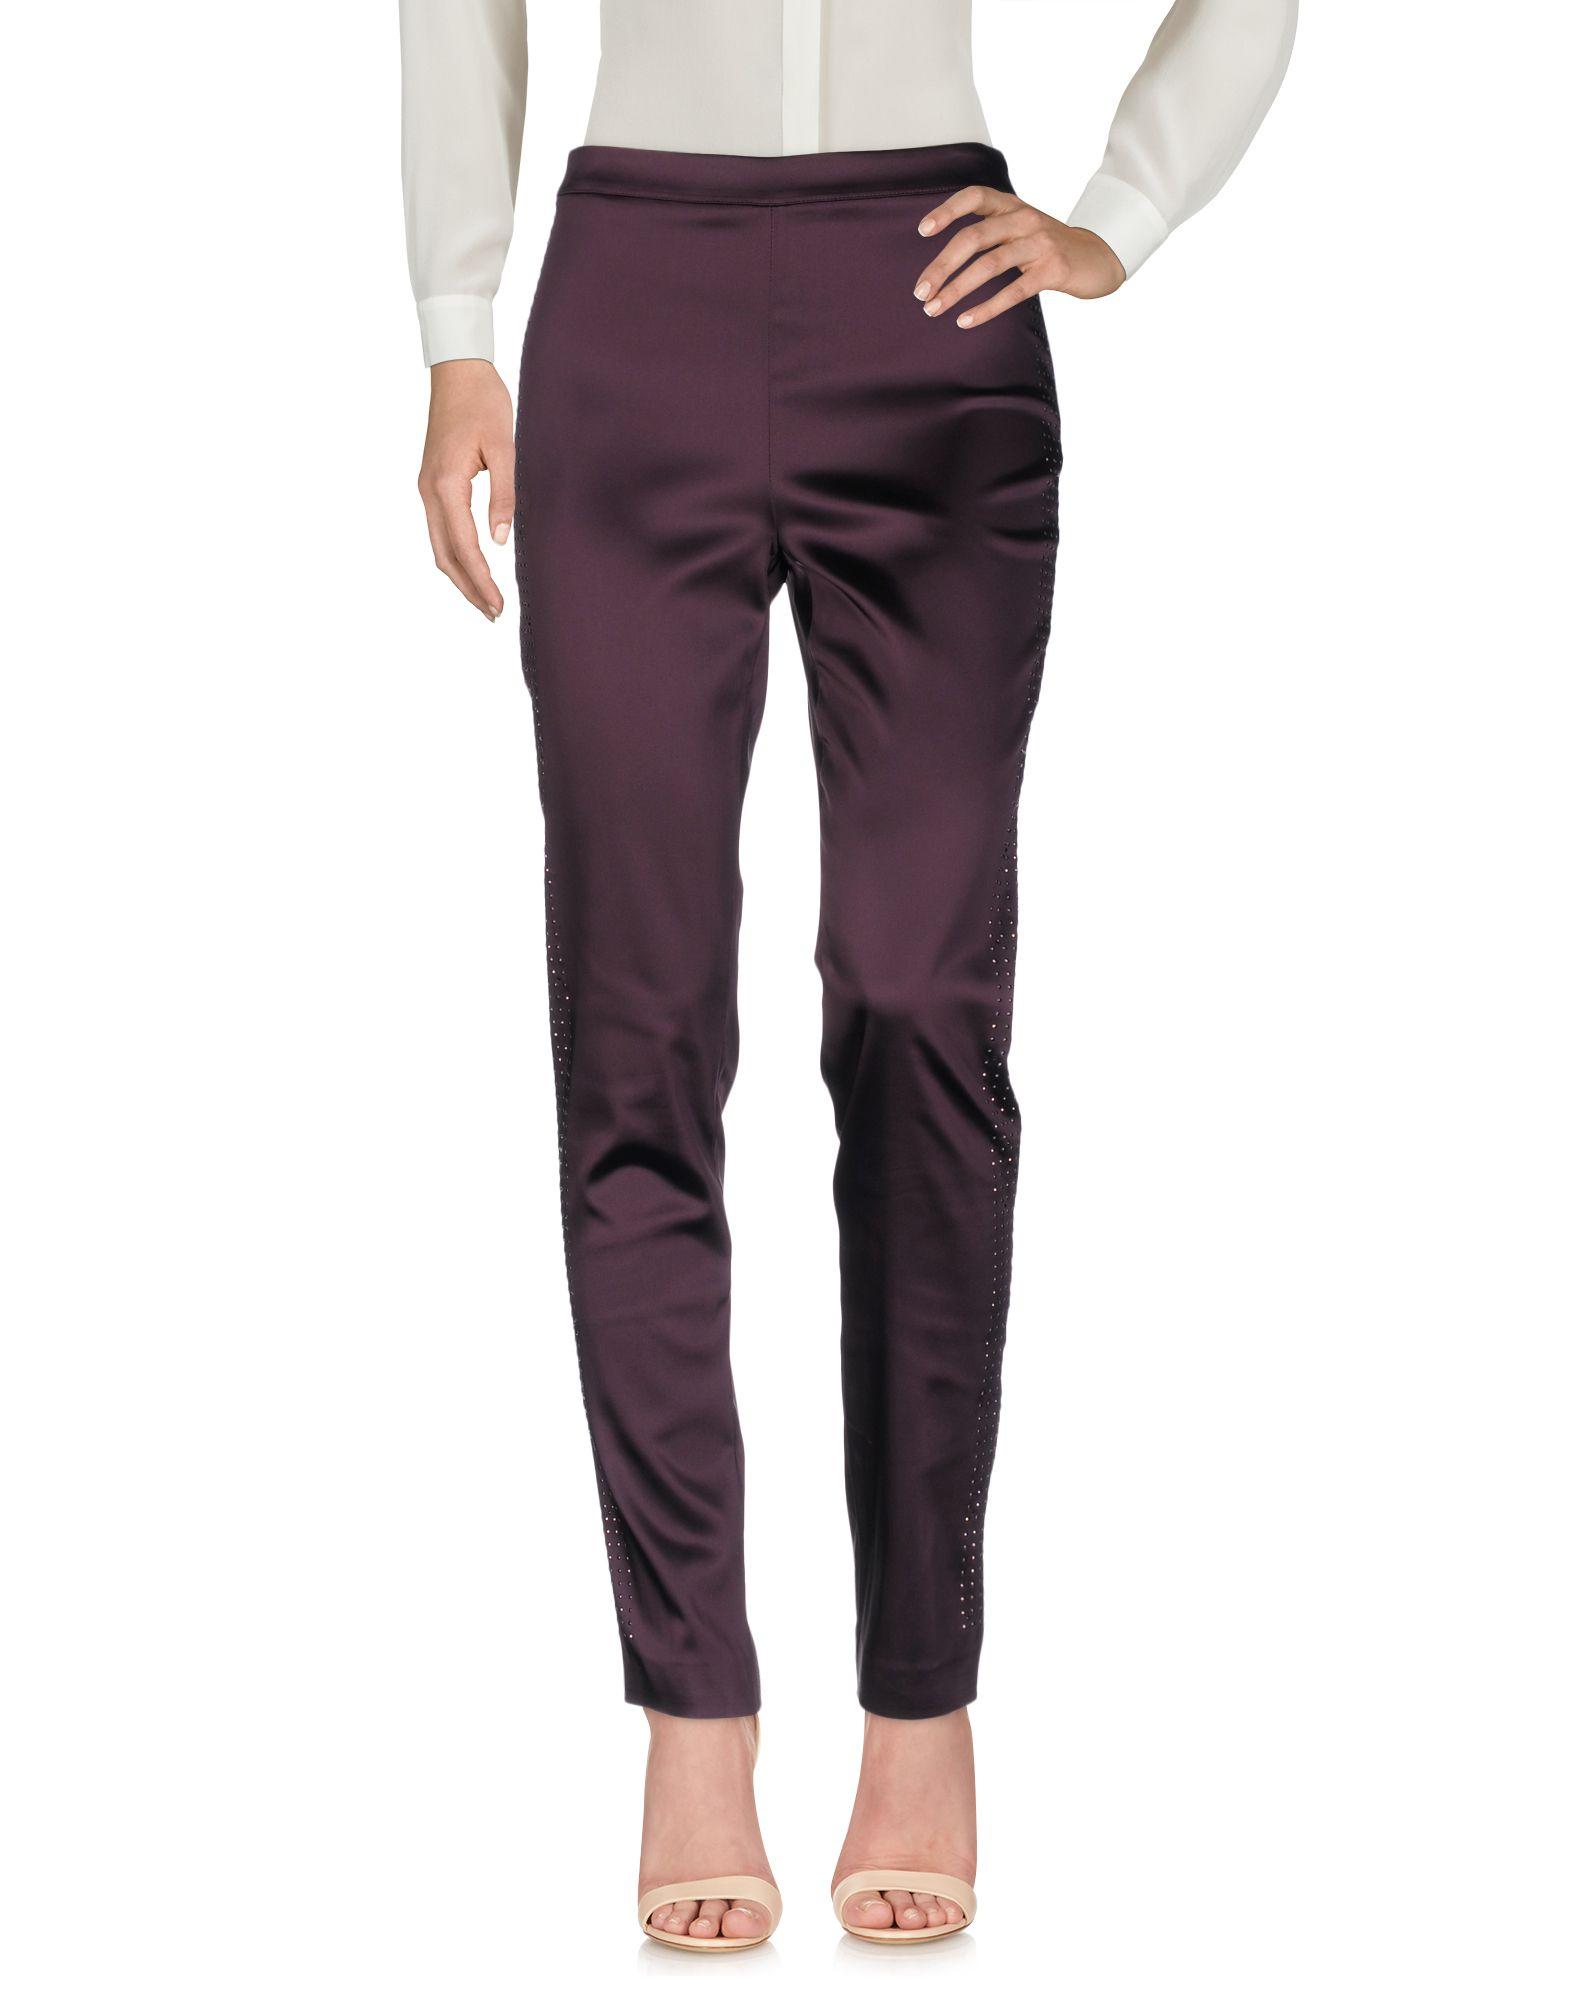 ELISA FANTI Повседневные брюки запонки fanti 10 c 1052 20 e